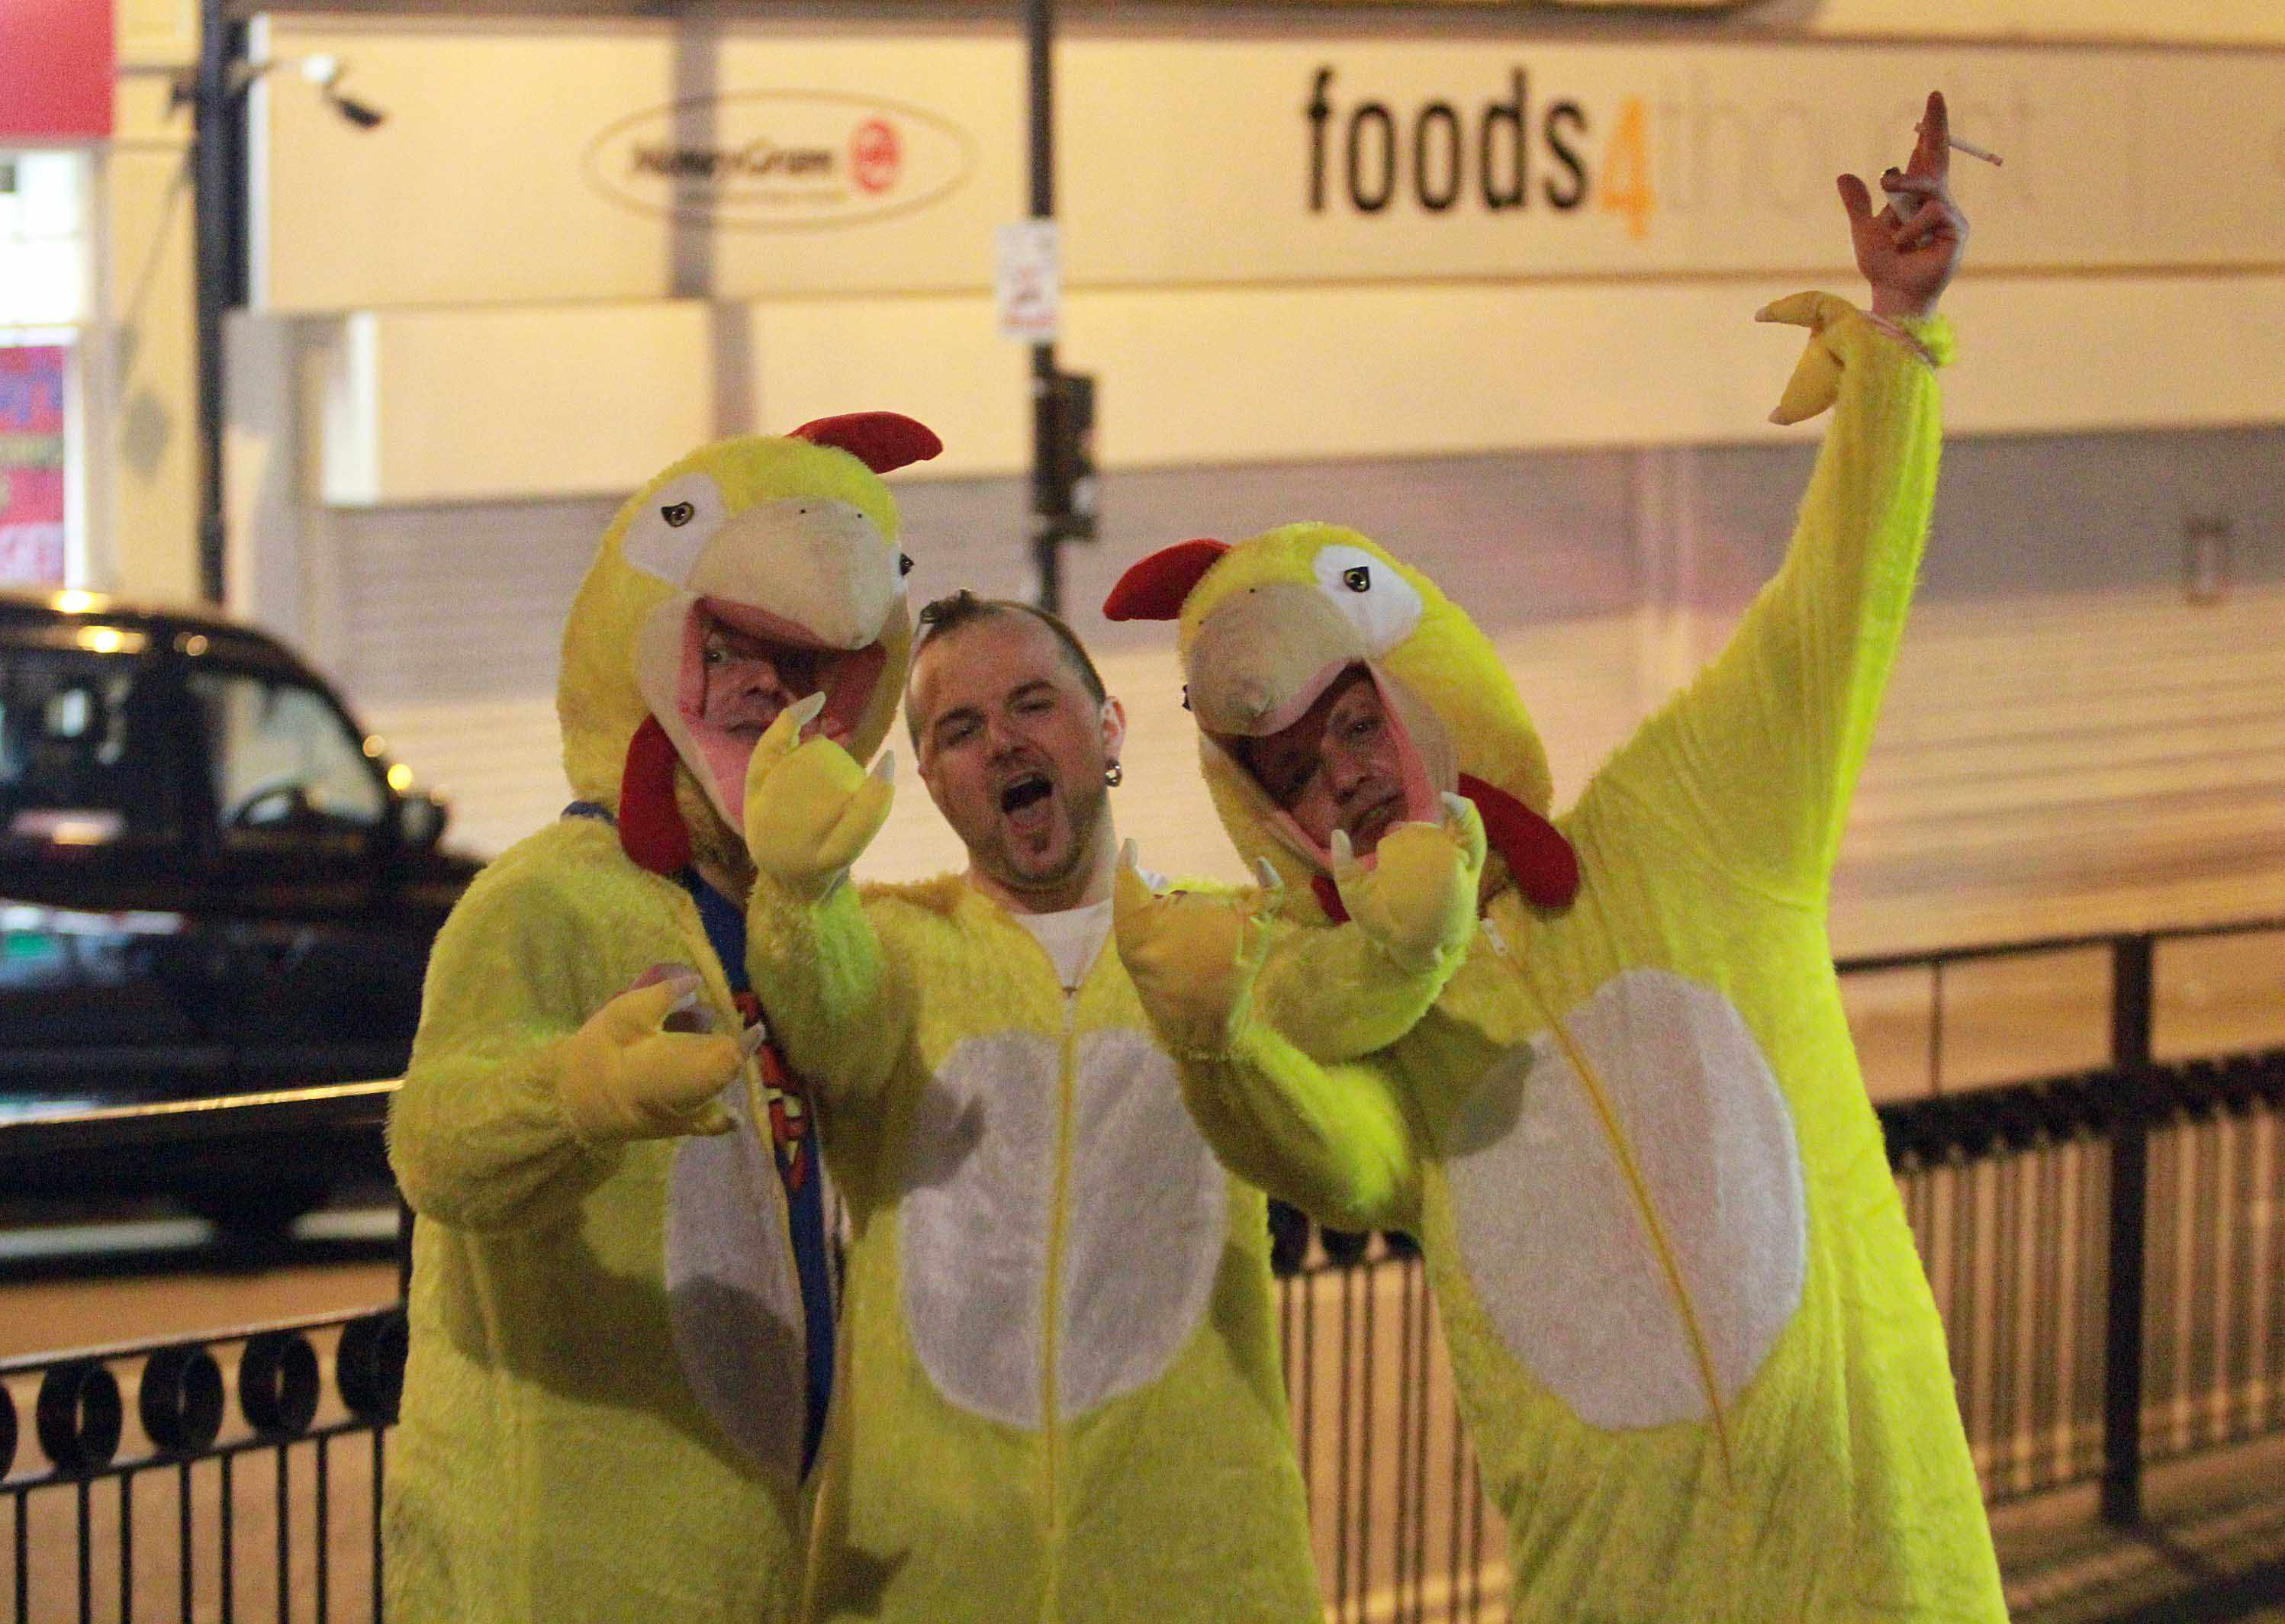 Wolverhampton's busy Saturday night